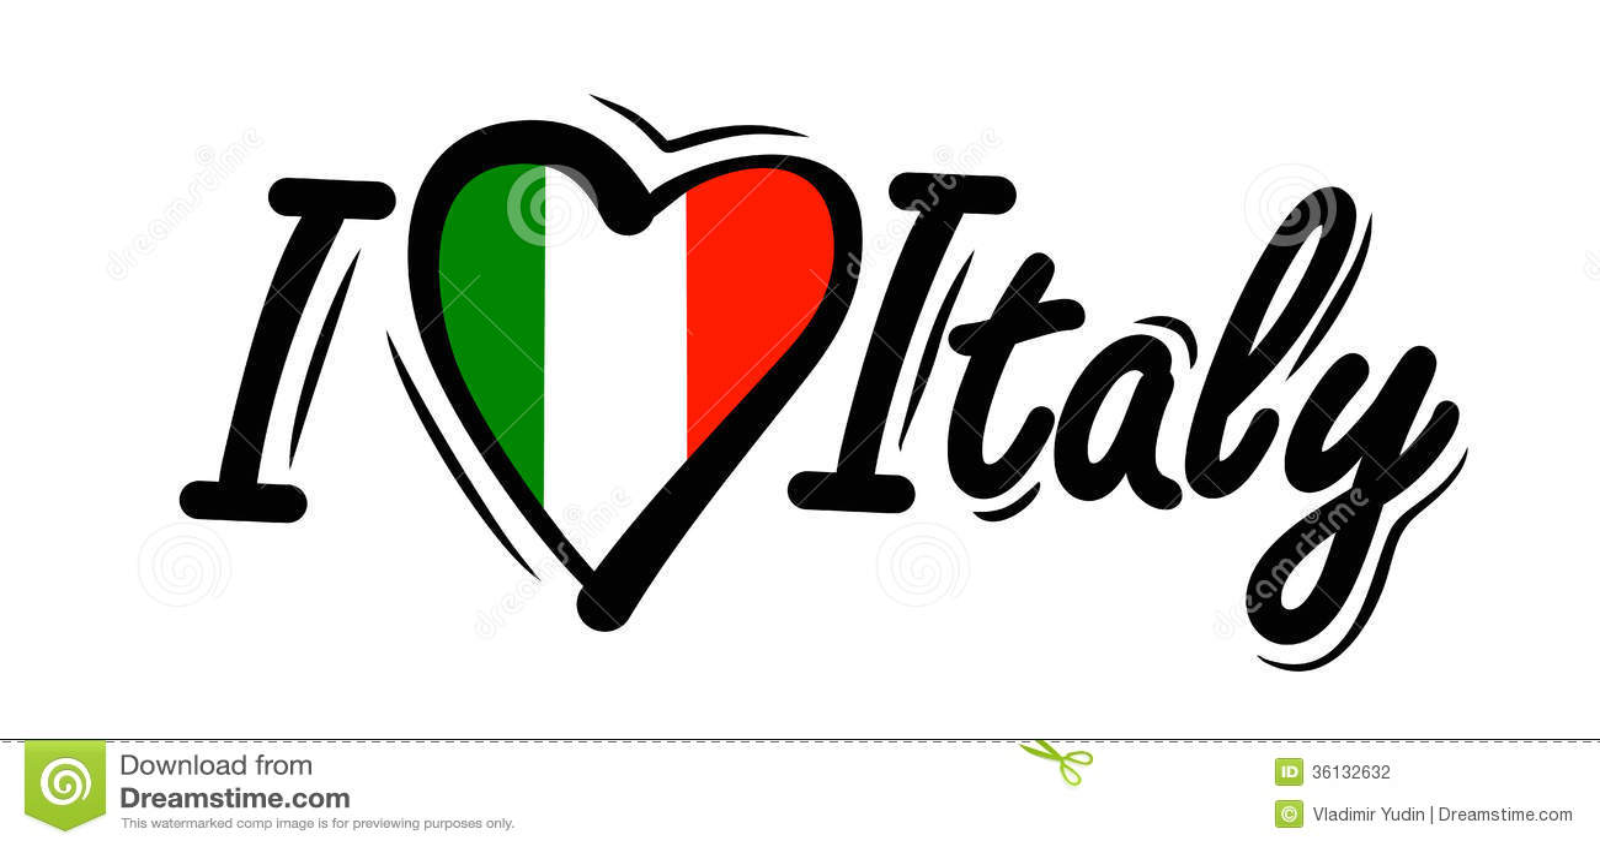 I Love Italy Vector Stock Vector Illustration Of National 36132632